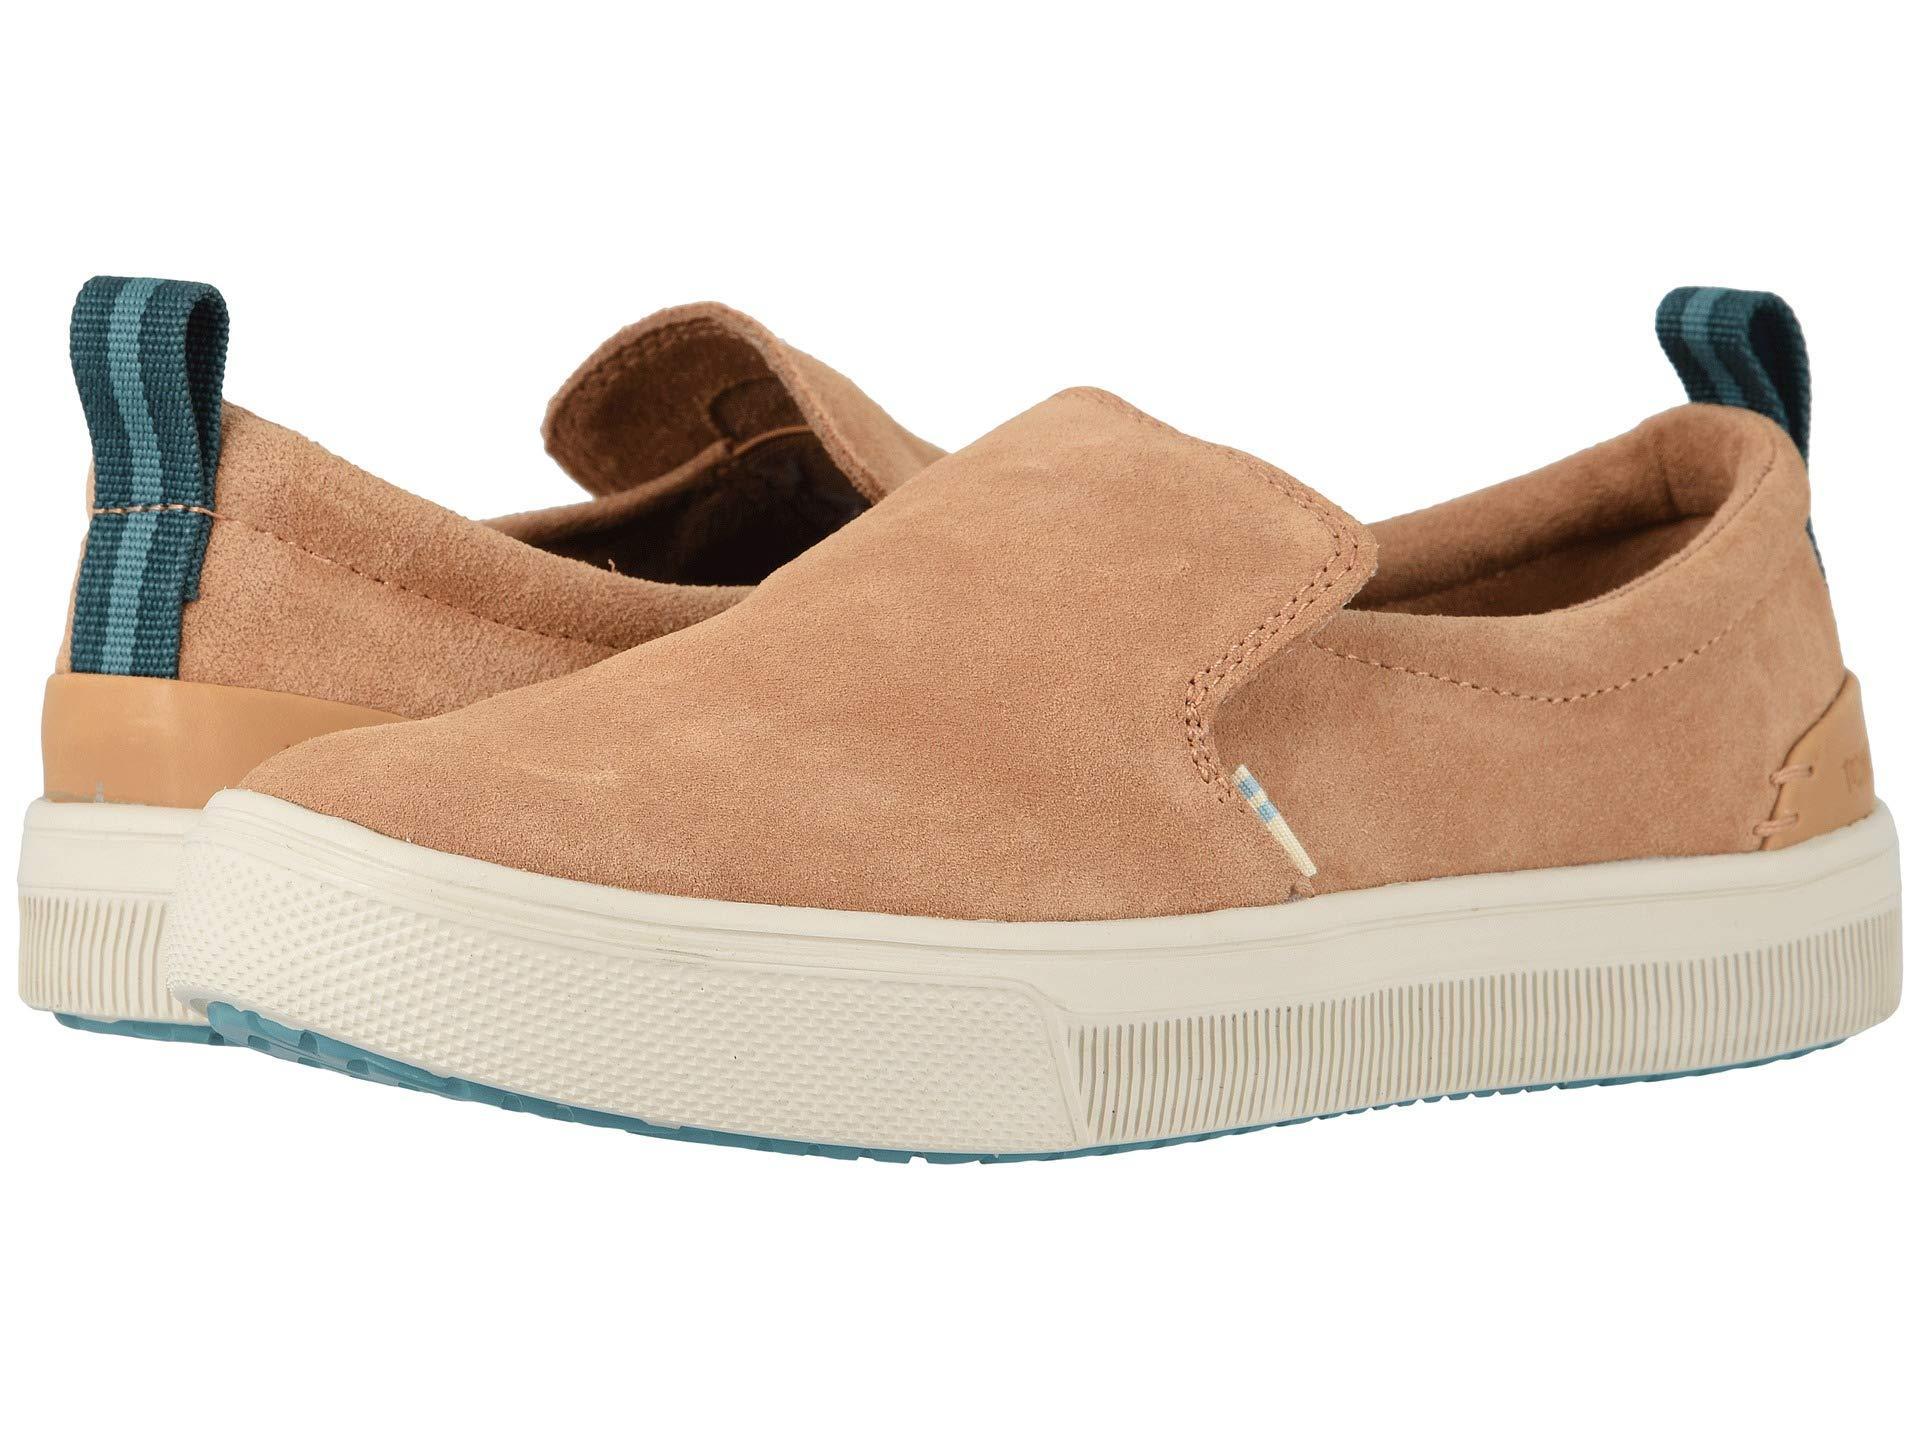 38c777f792f Lyst - TOMS Trvl Lite Slip-on (honey Suede) Women s Shoes